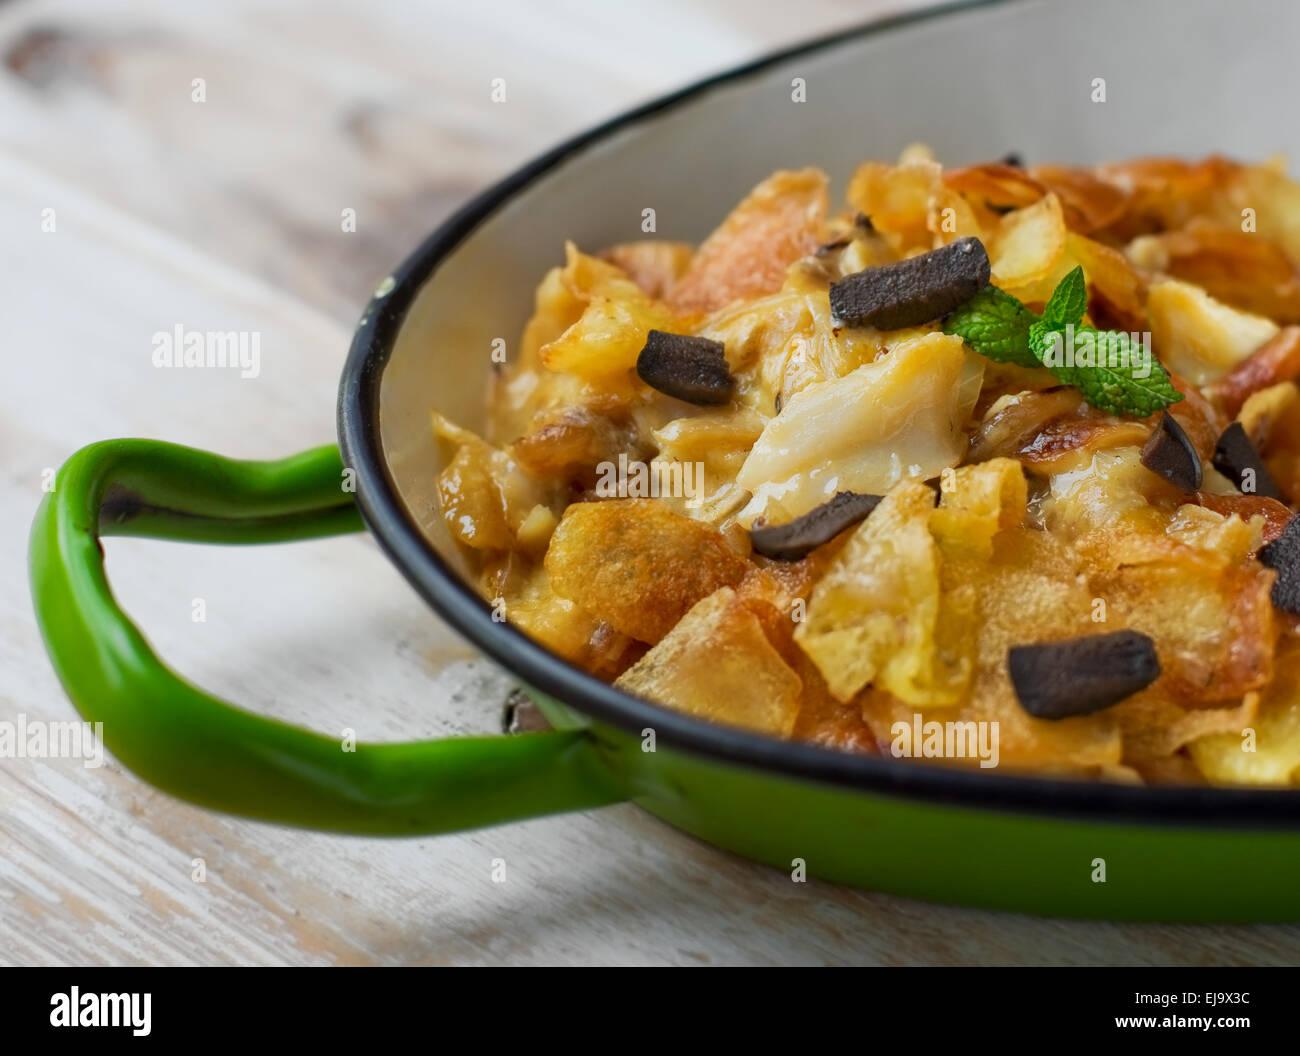 Cod Bras style (Bacalhau a Bras). Portuguese cuisine. - Stock Image